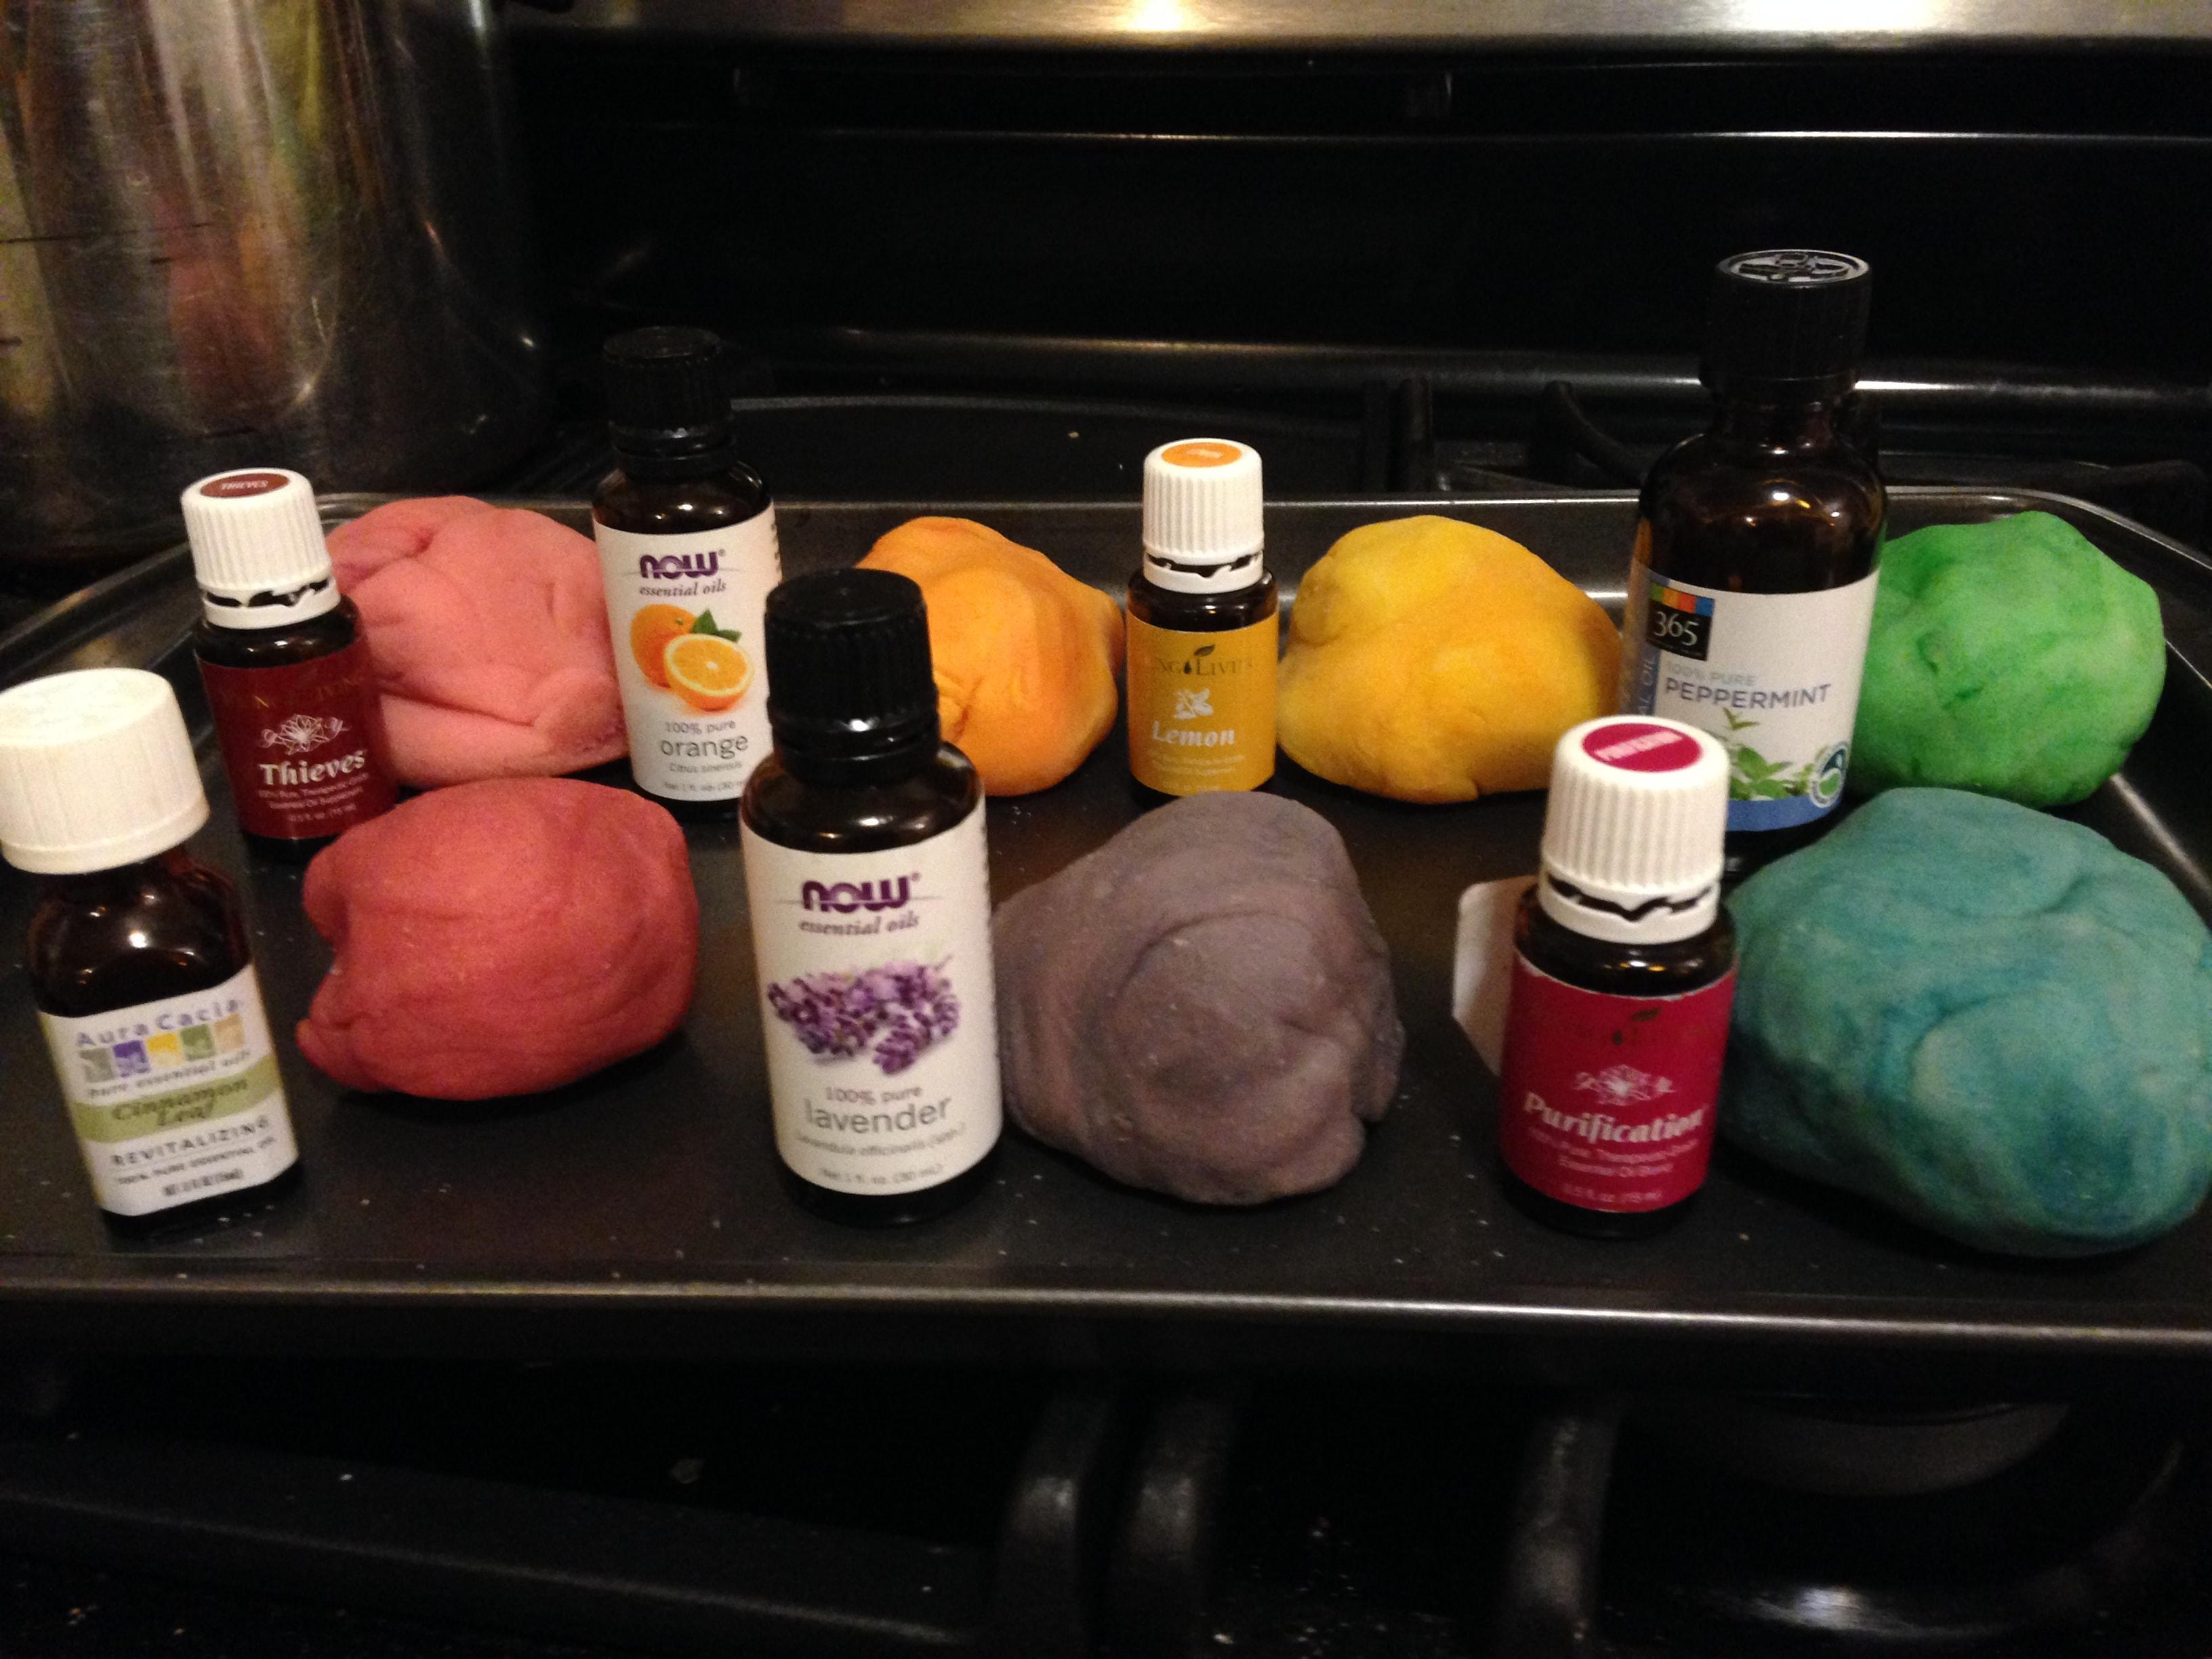 1 Aromatherapy play dough